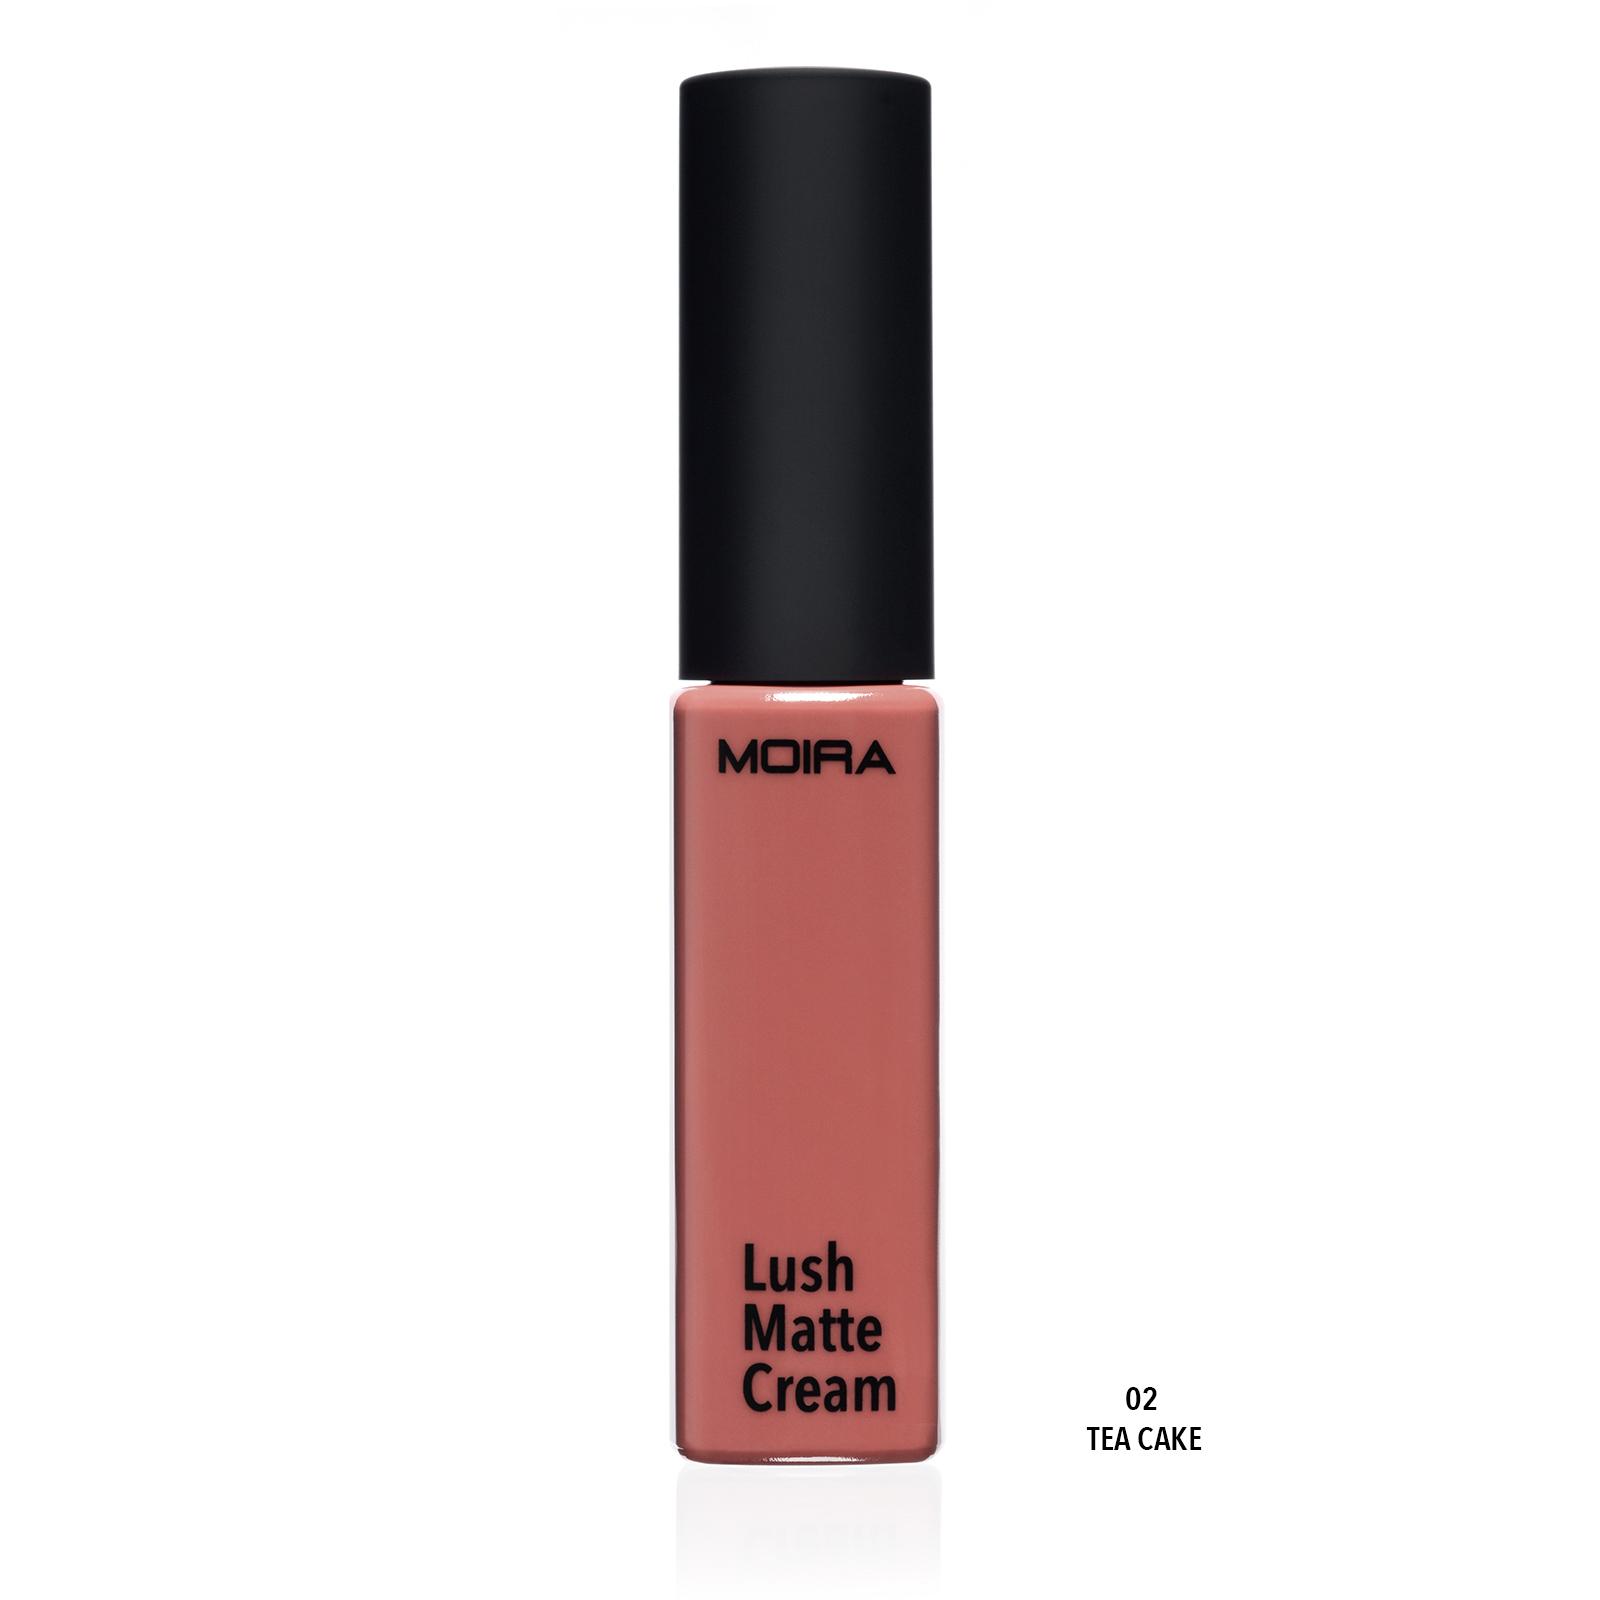 lmc02-lush-matte-cream-moira.jpg